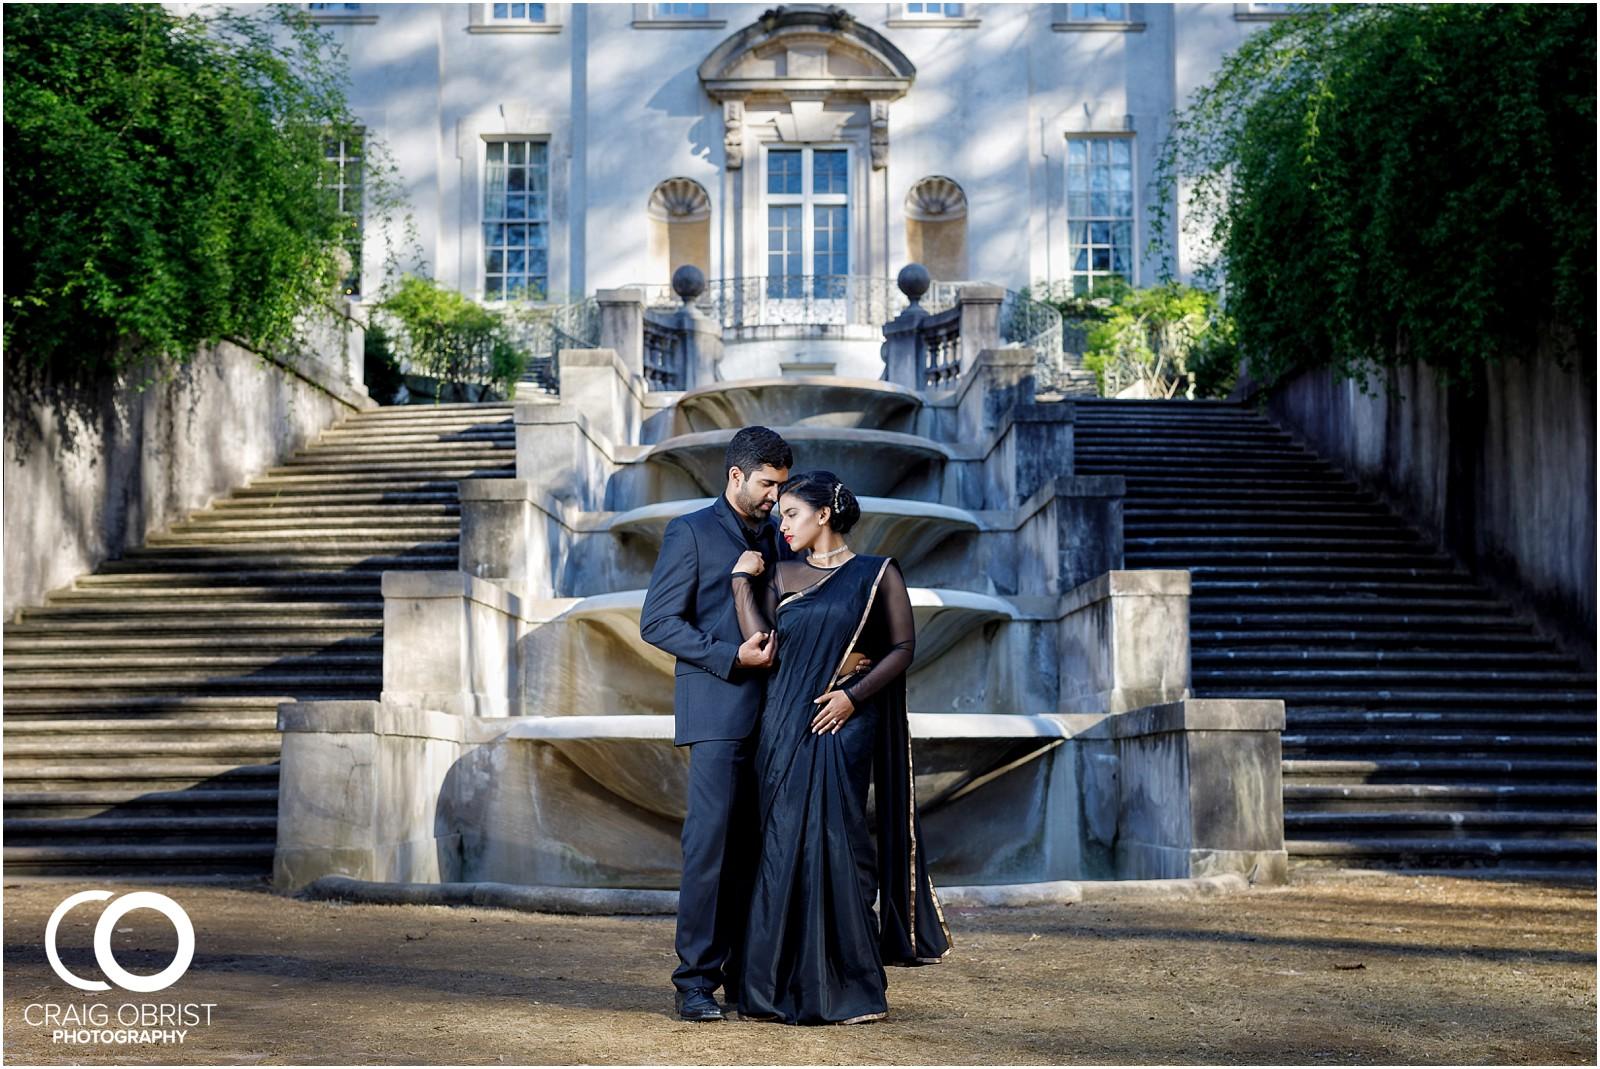 Swan House Atlanta History Center Engagement Portraits_0019.jpg